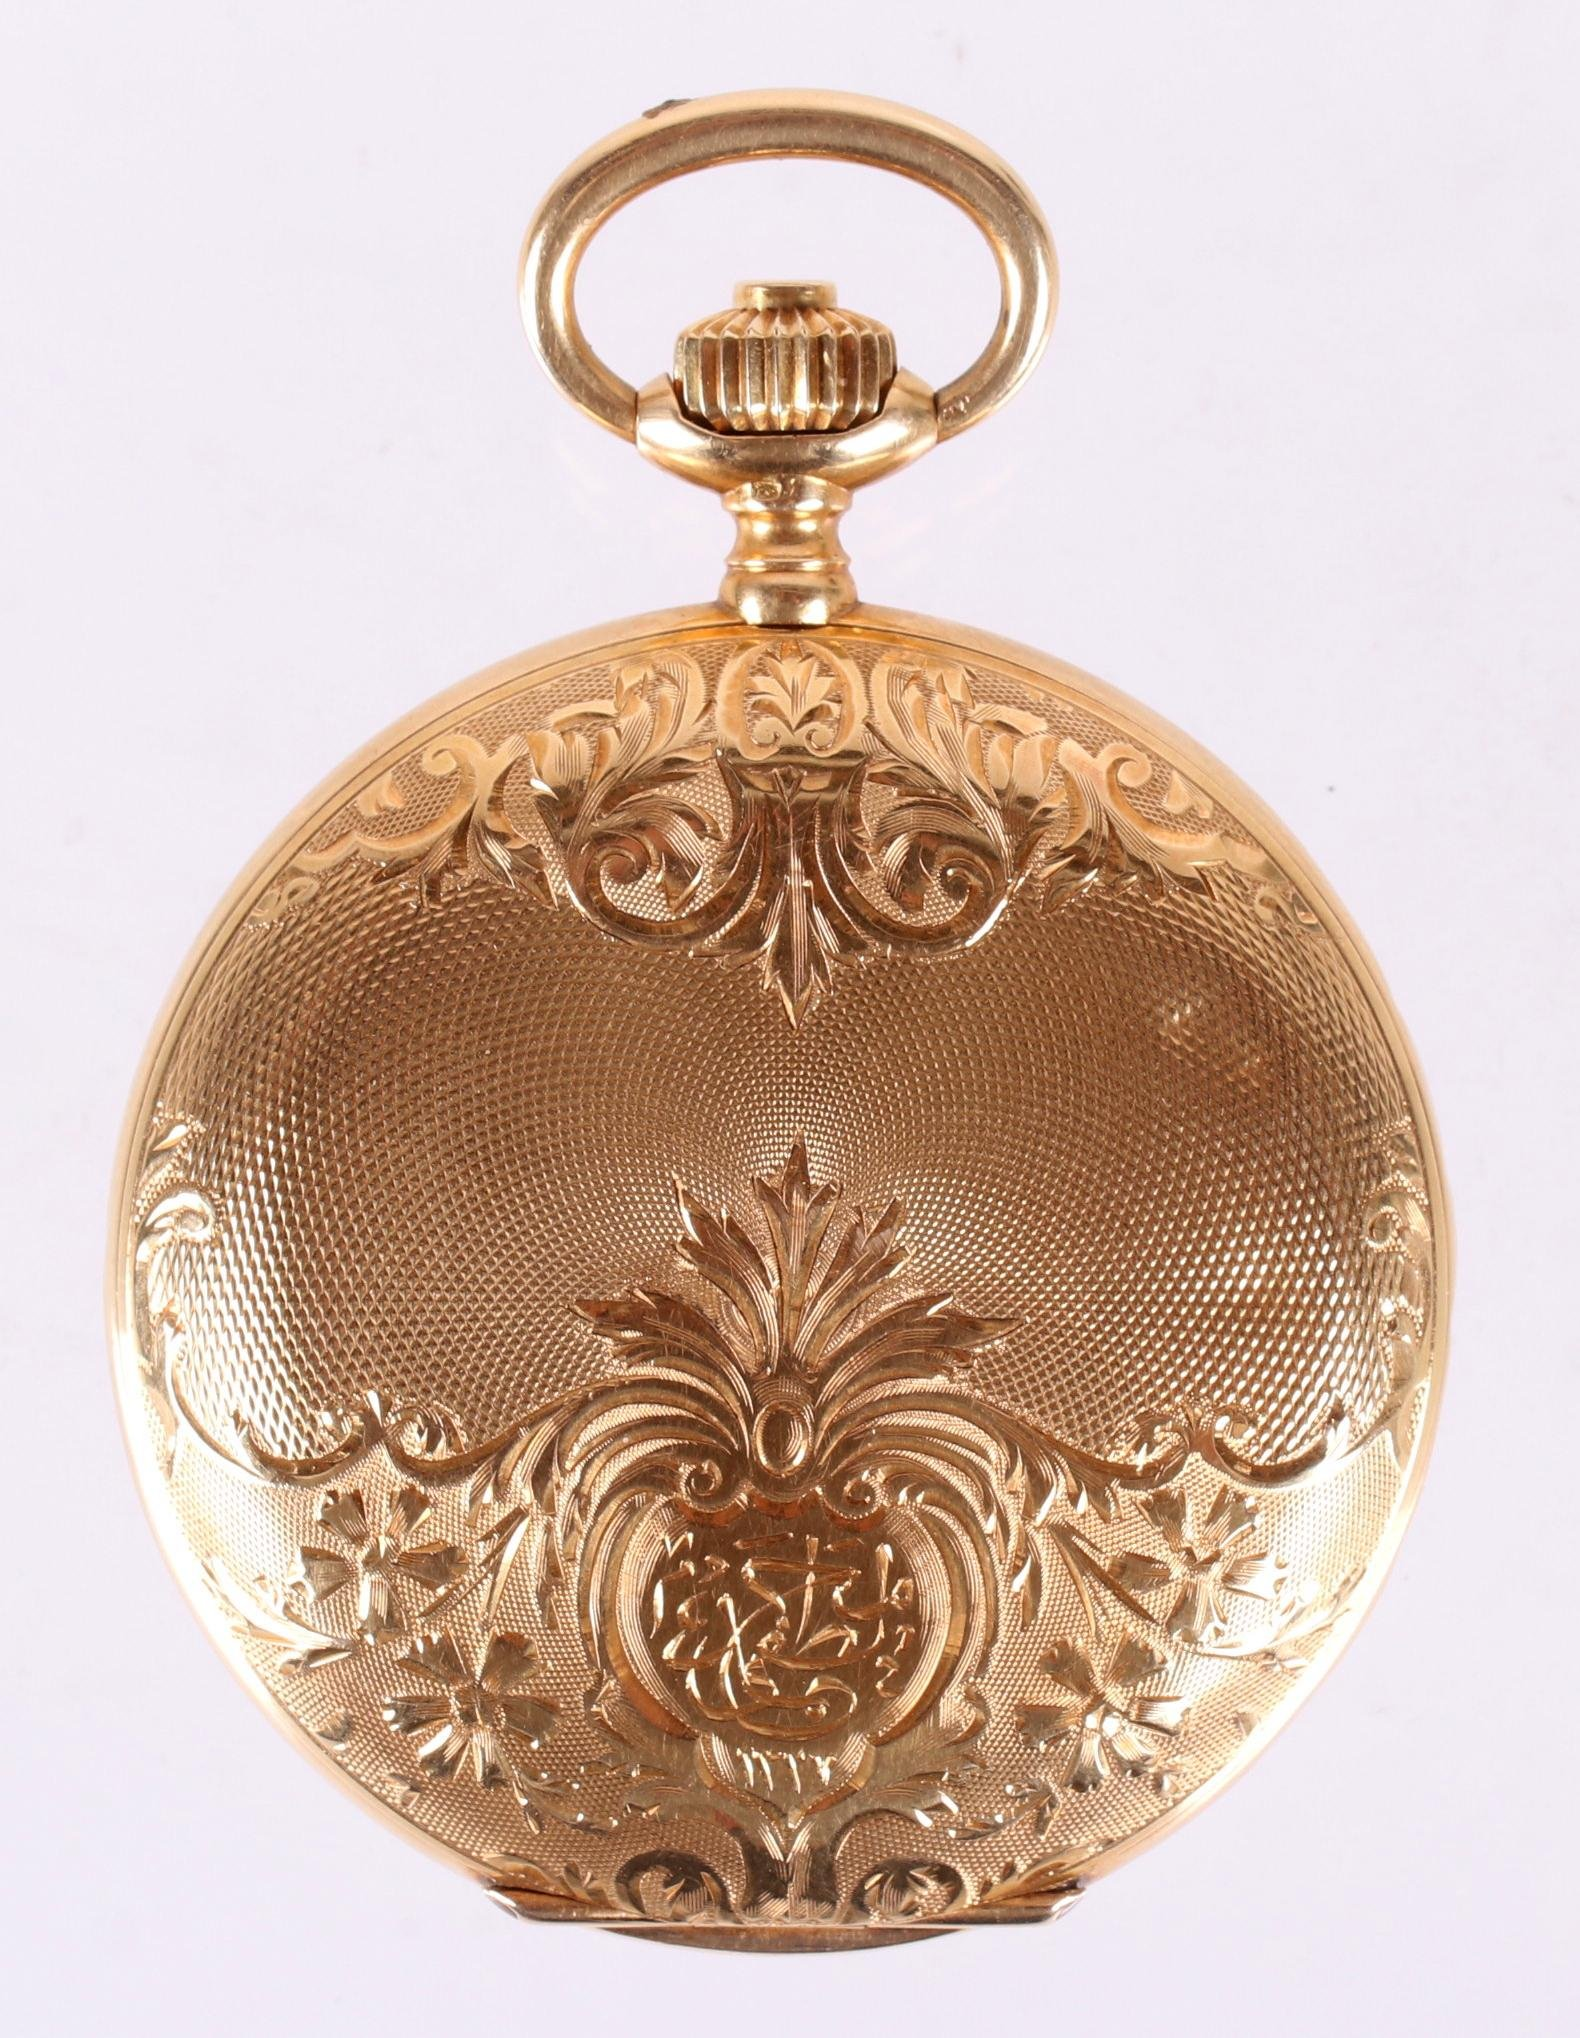 Longines 18k Gold Pocket Watch